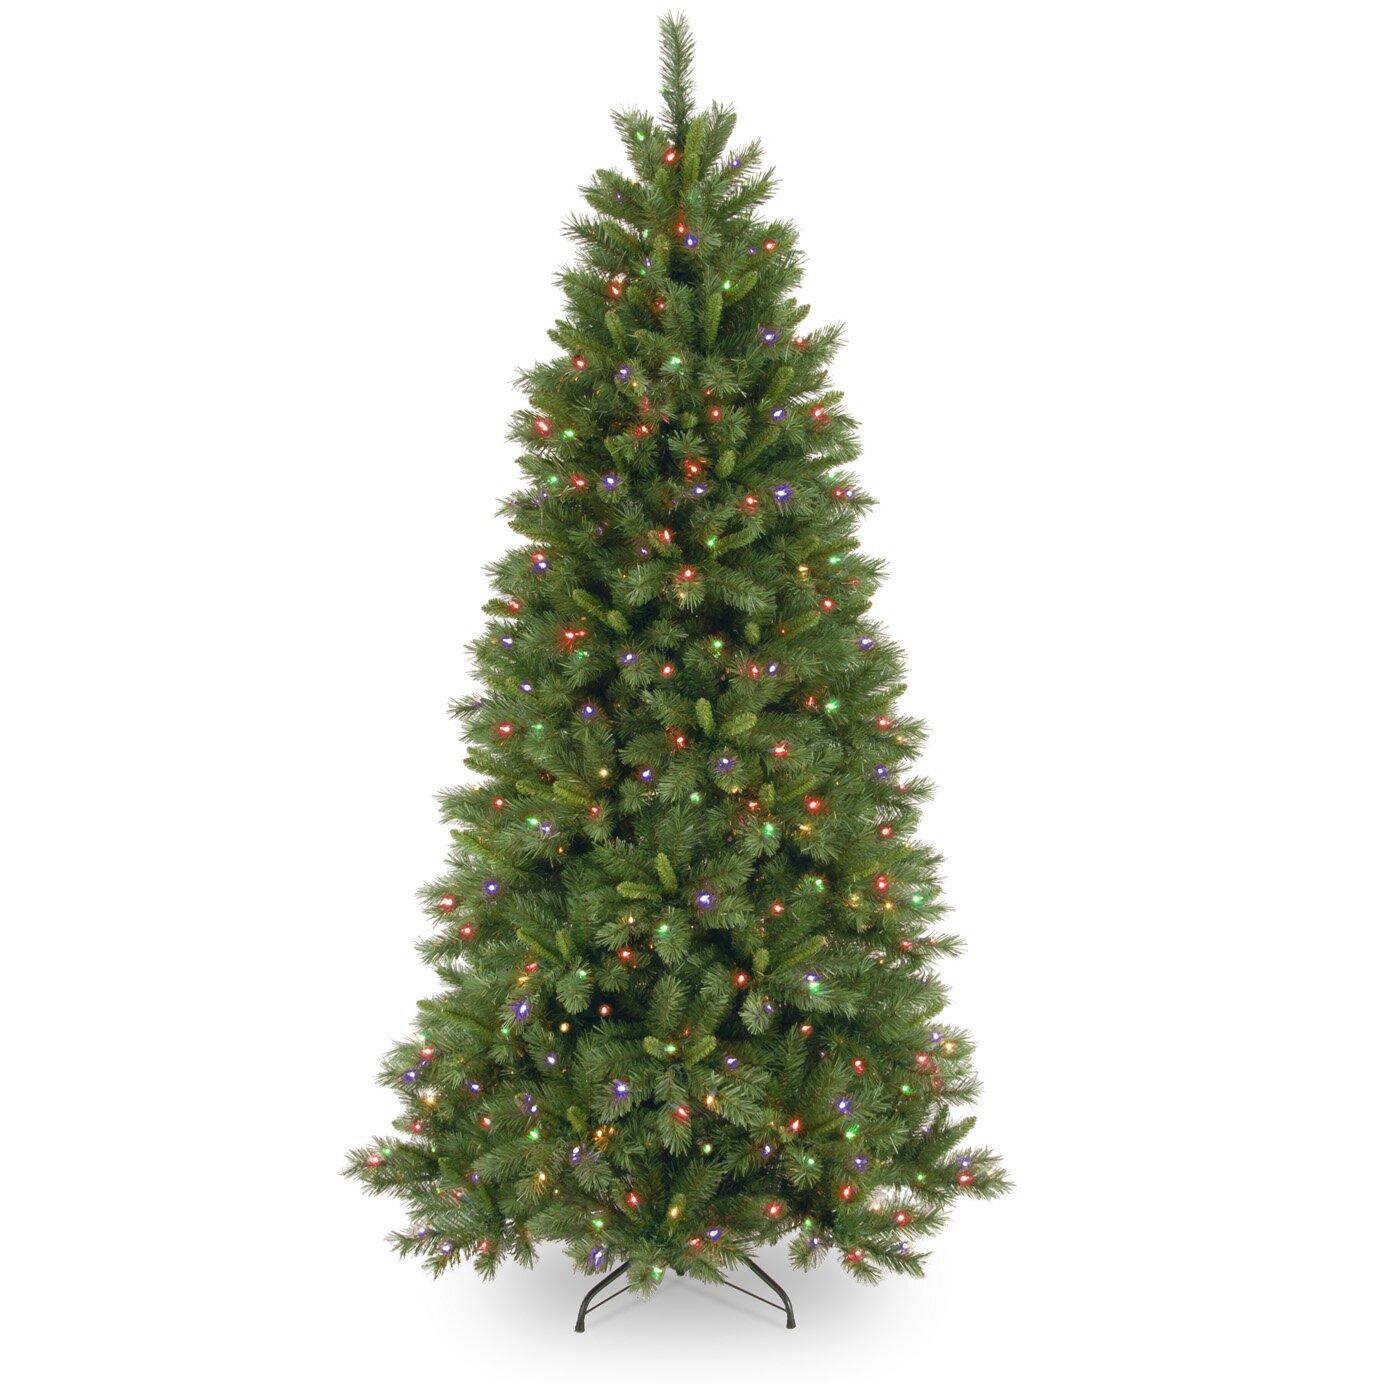 Kmart Christmas Tree Decorations